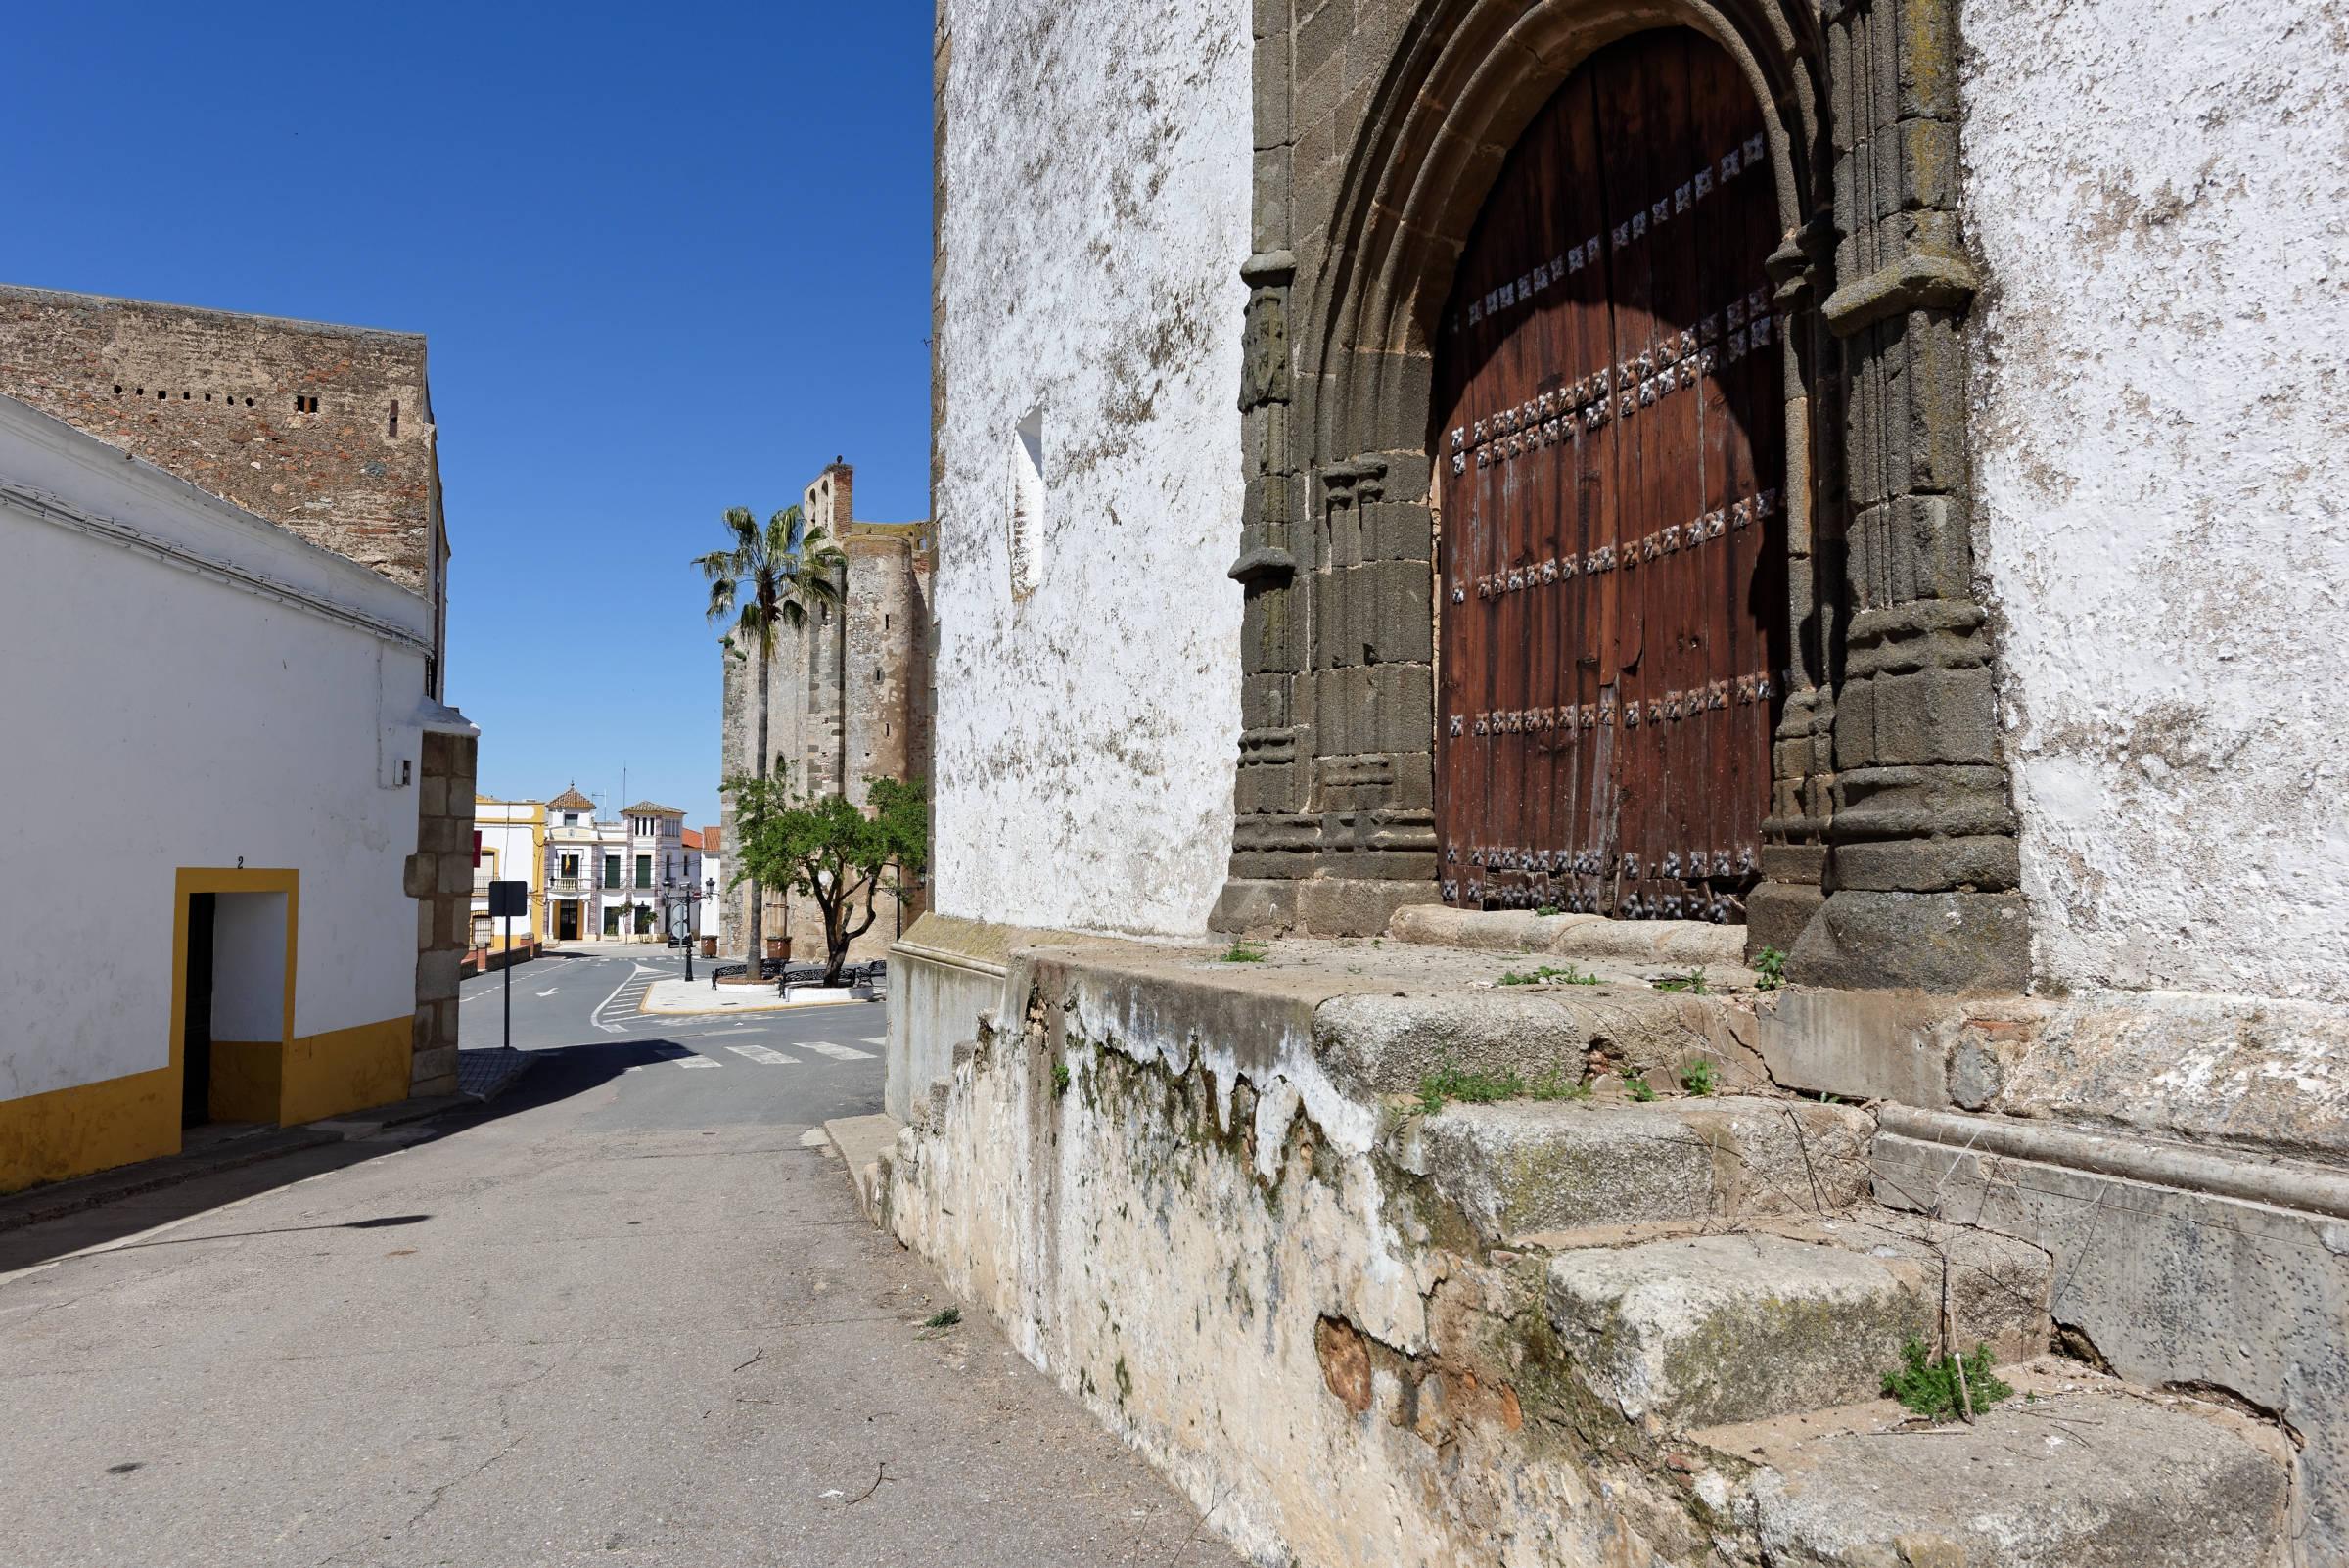 160407-La Albuera (Estremadure) (23)